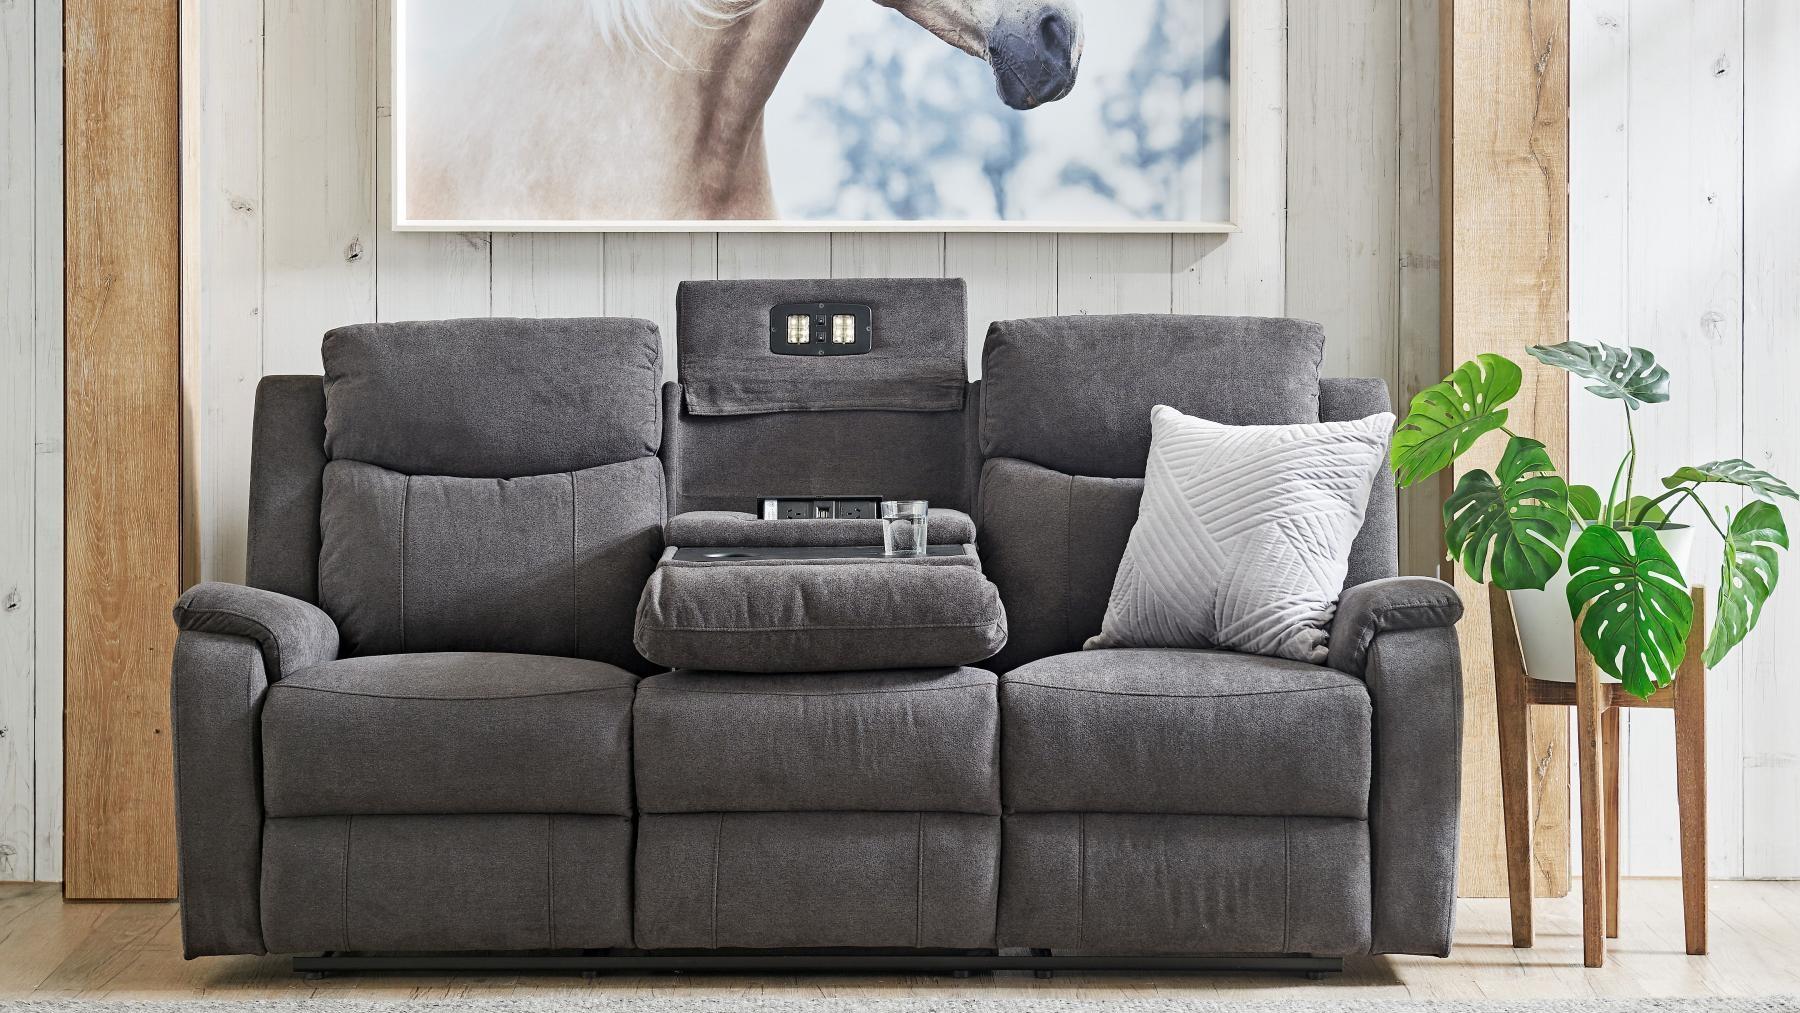 Magnificent Cheap Gatwick 3 Seater Fabric Sofa Harvey Norman Au Creativecarmelina Interior Chair Design Creativecarmelinacom